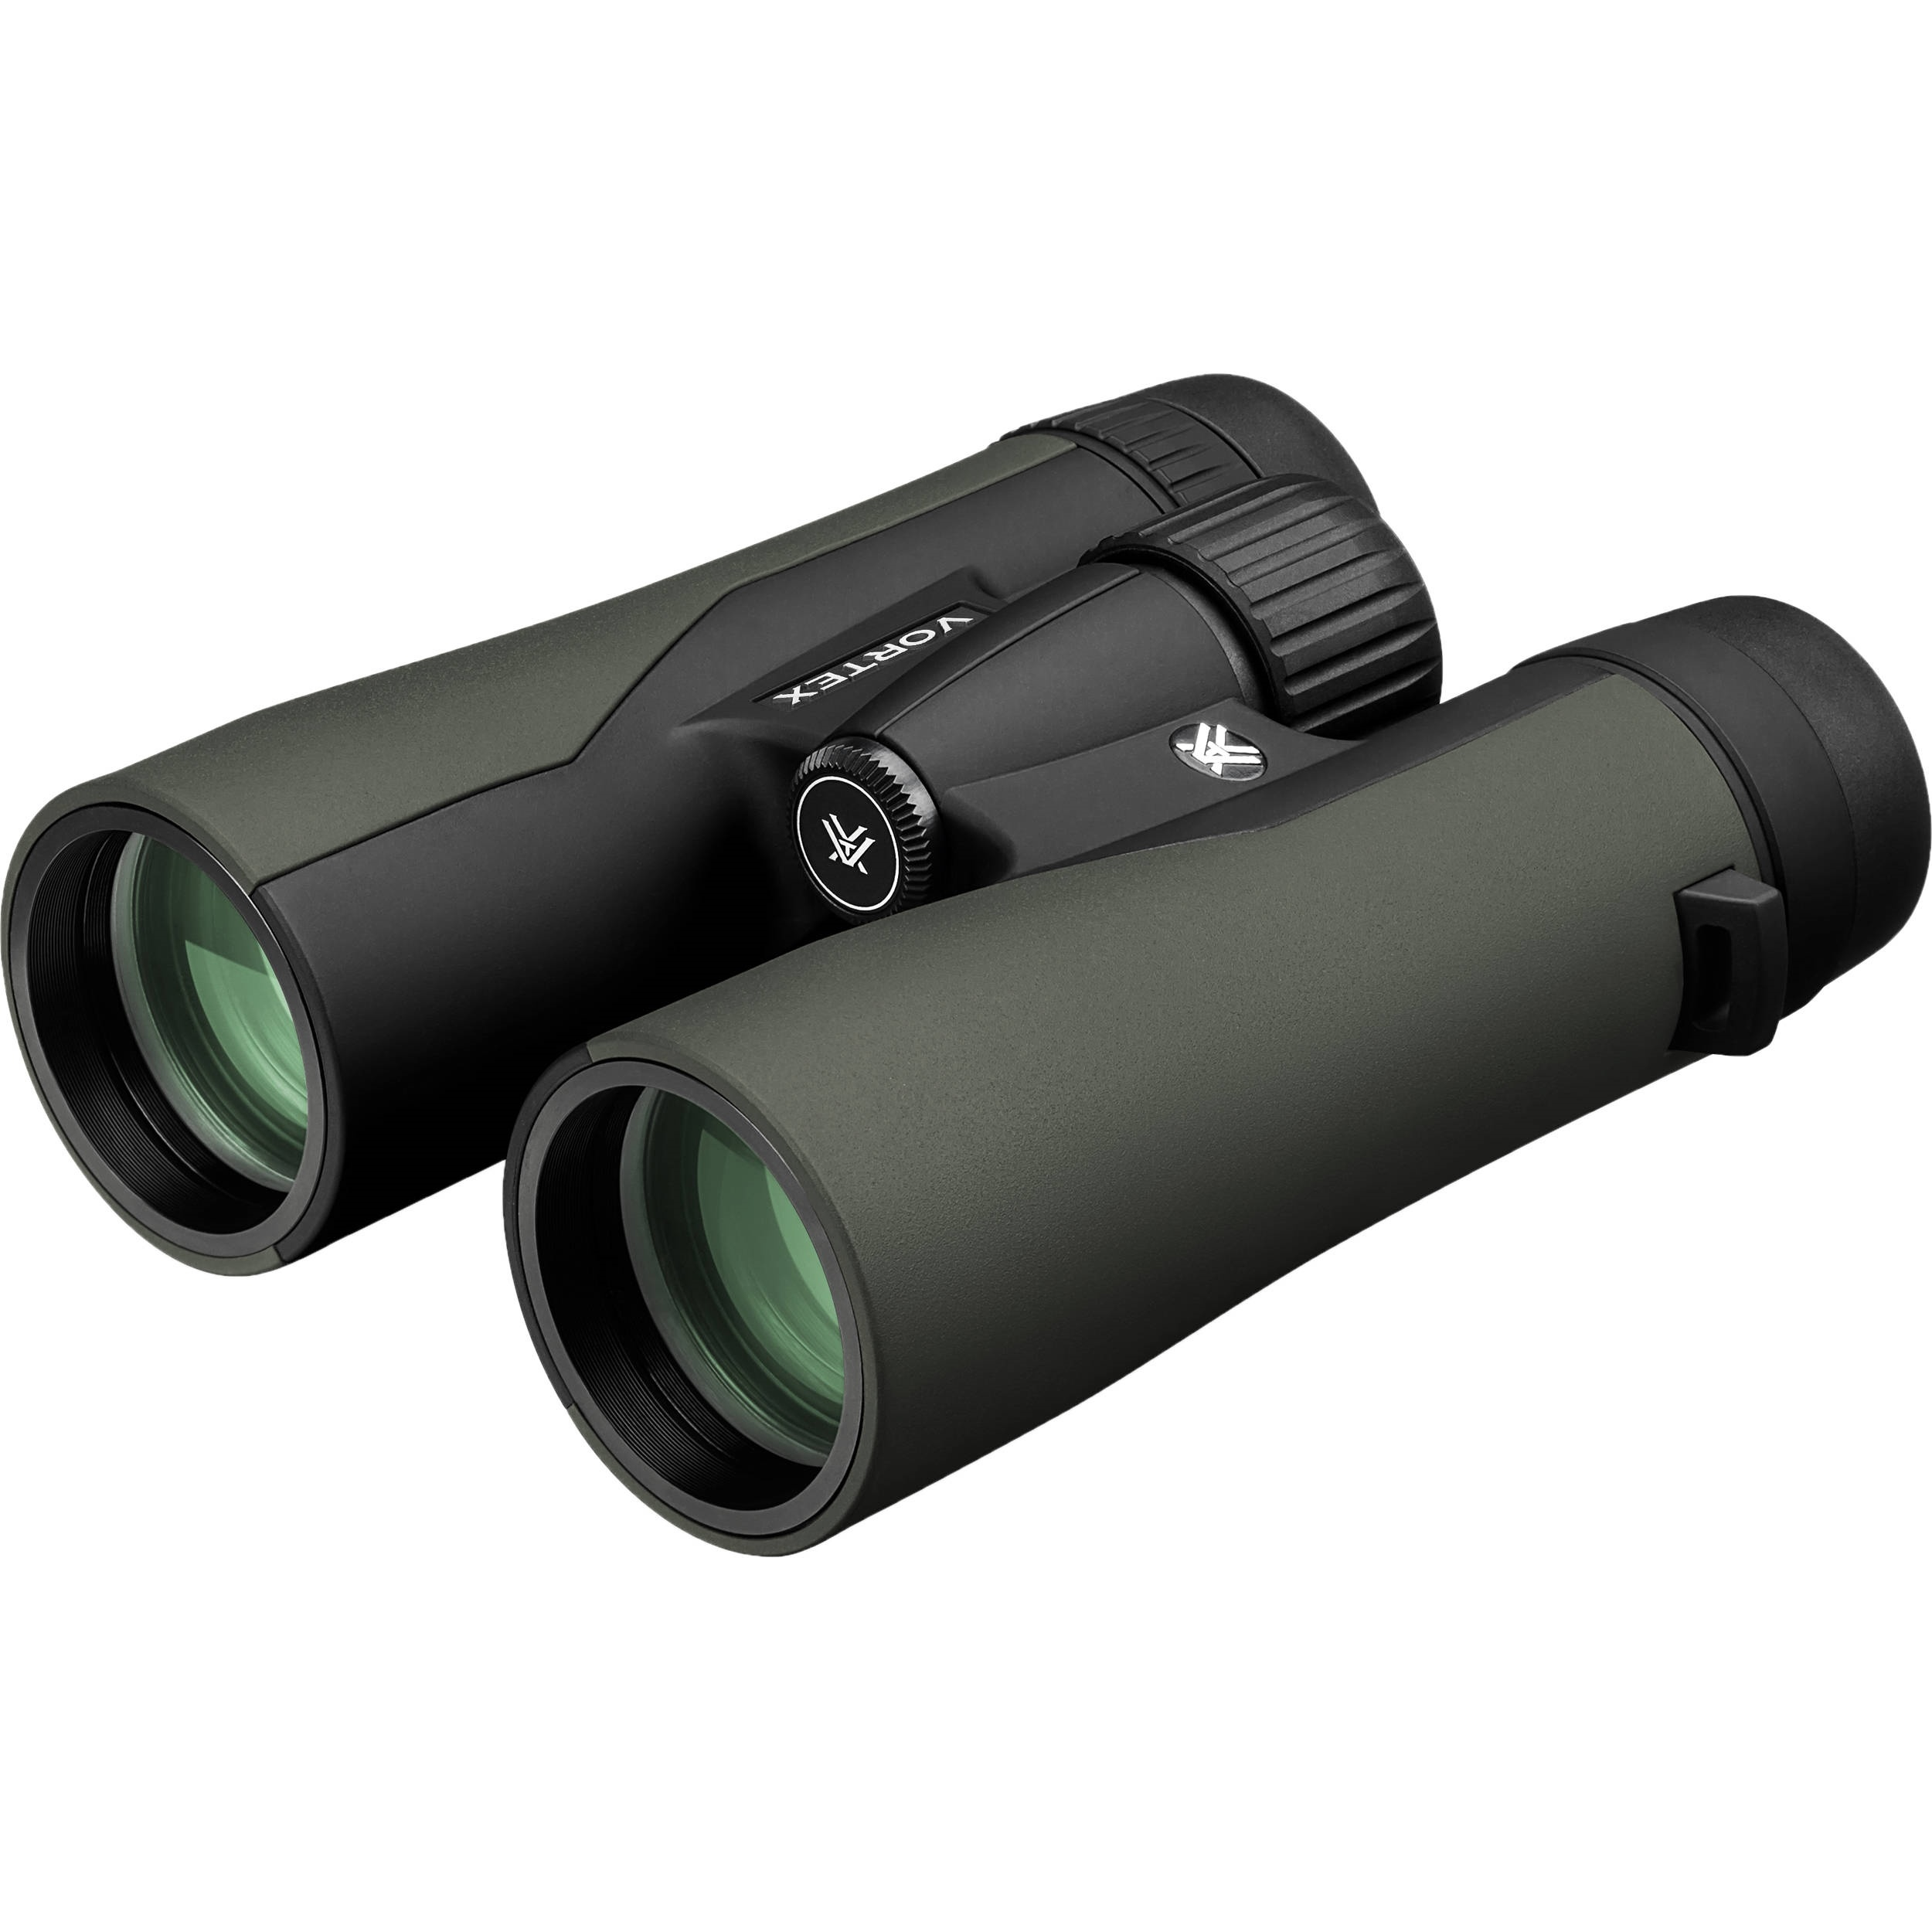 Vortex 8x42 Crossfire HD Binoculars